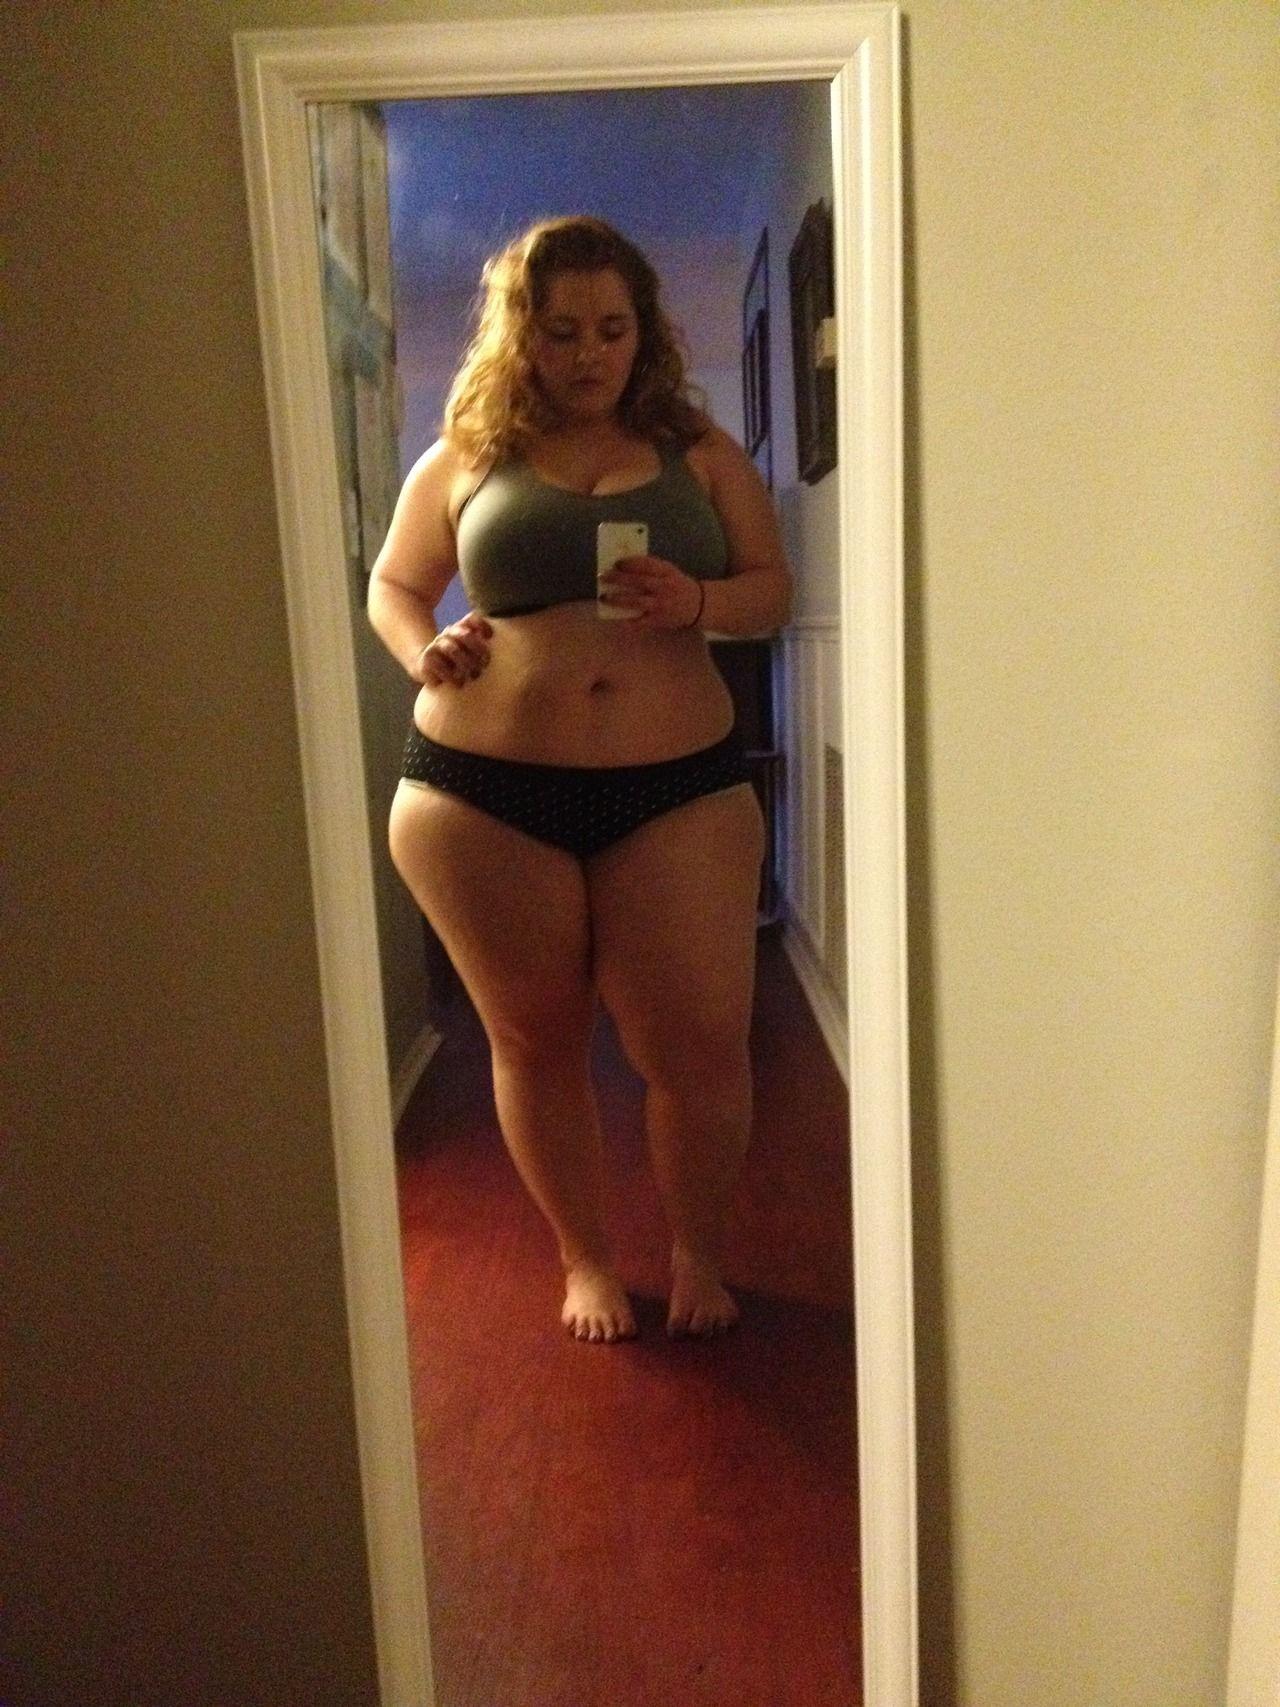 pinchris mallatratt on bbw selfies | pinterest | curvy, curves